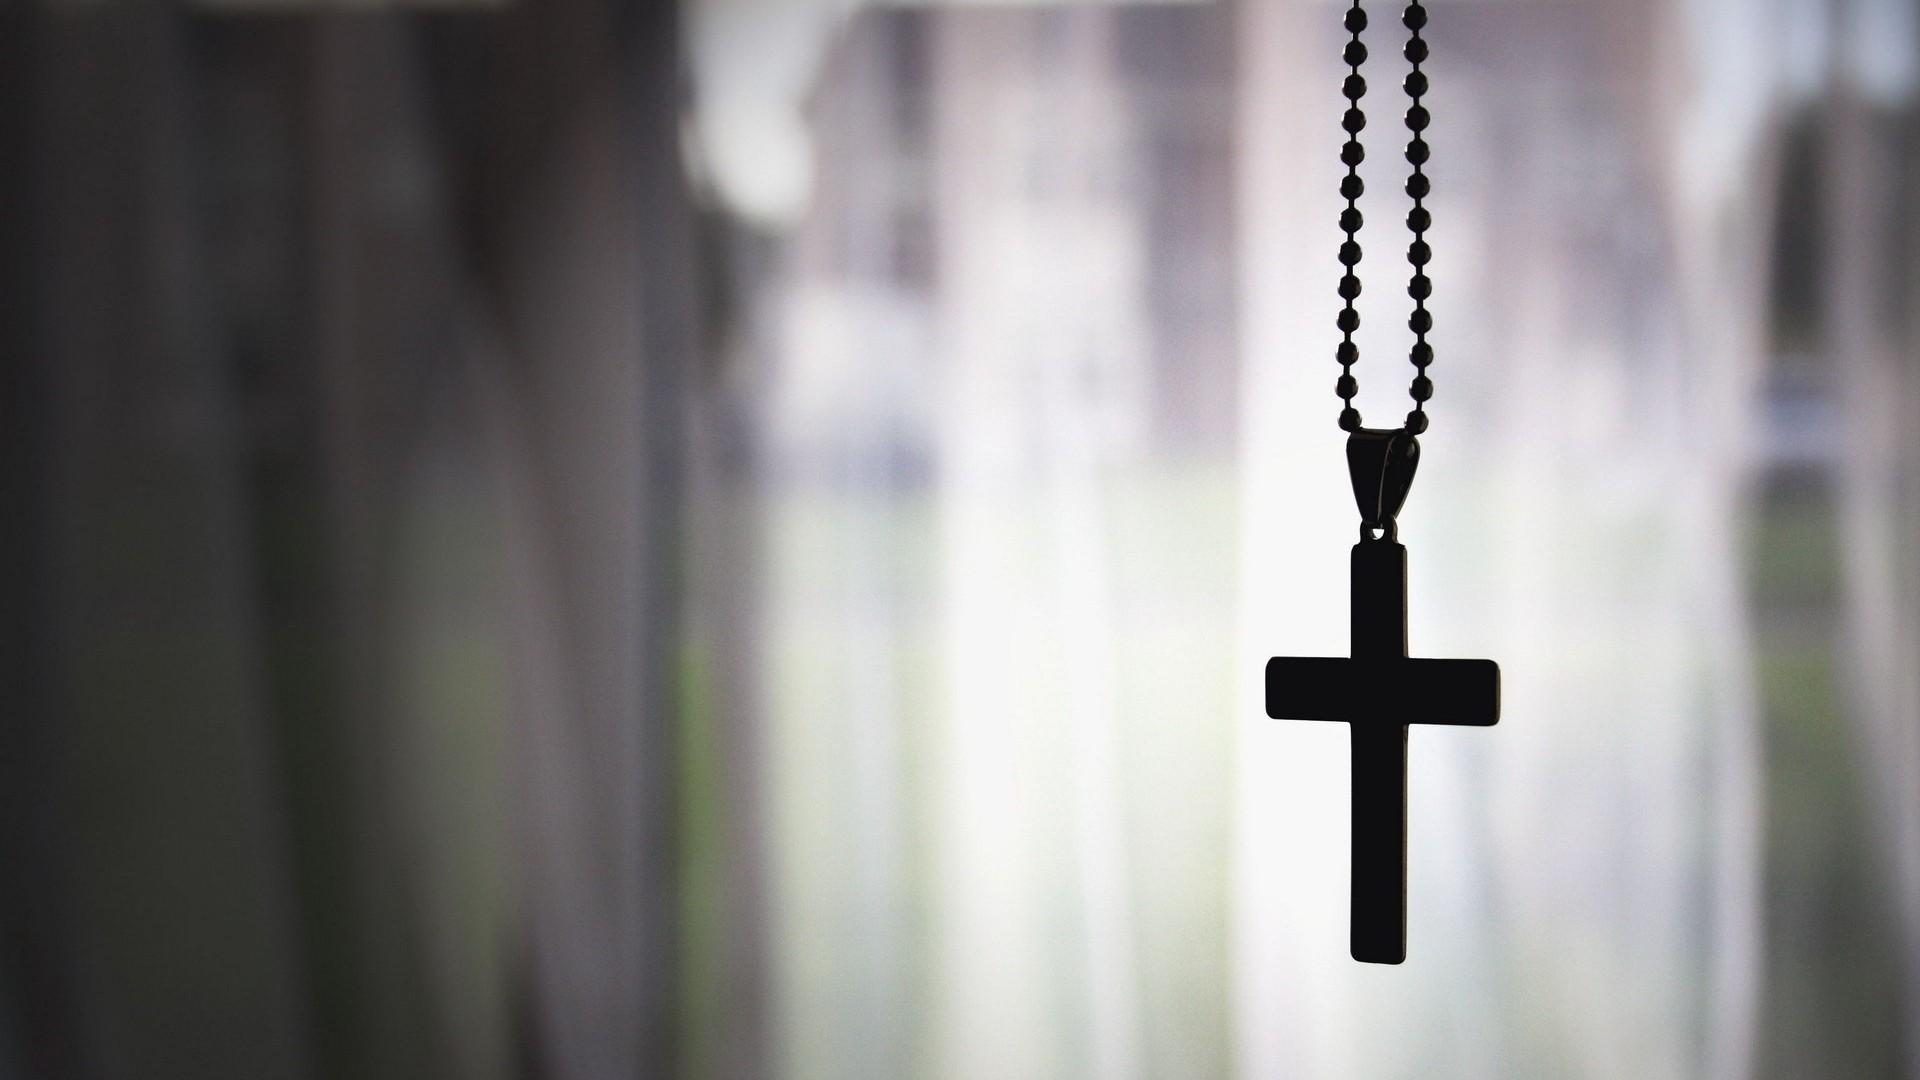 Christian Cross Wallpaper Hd 1080p